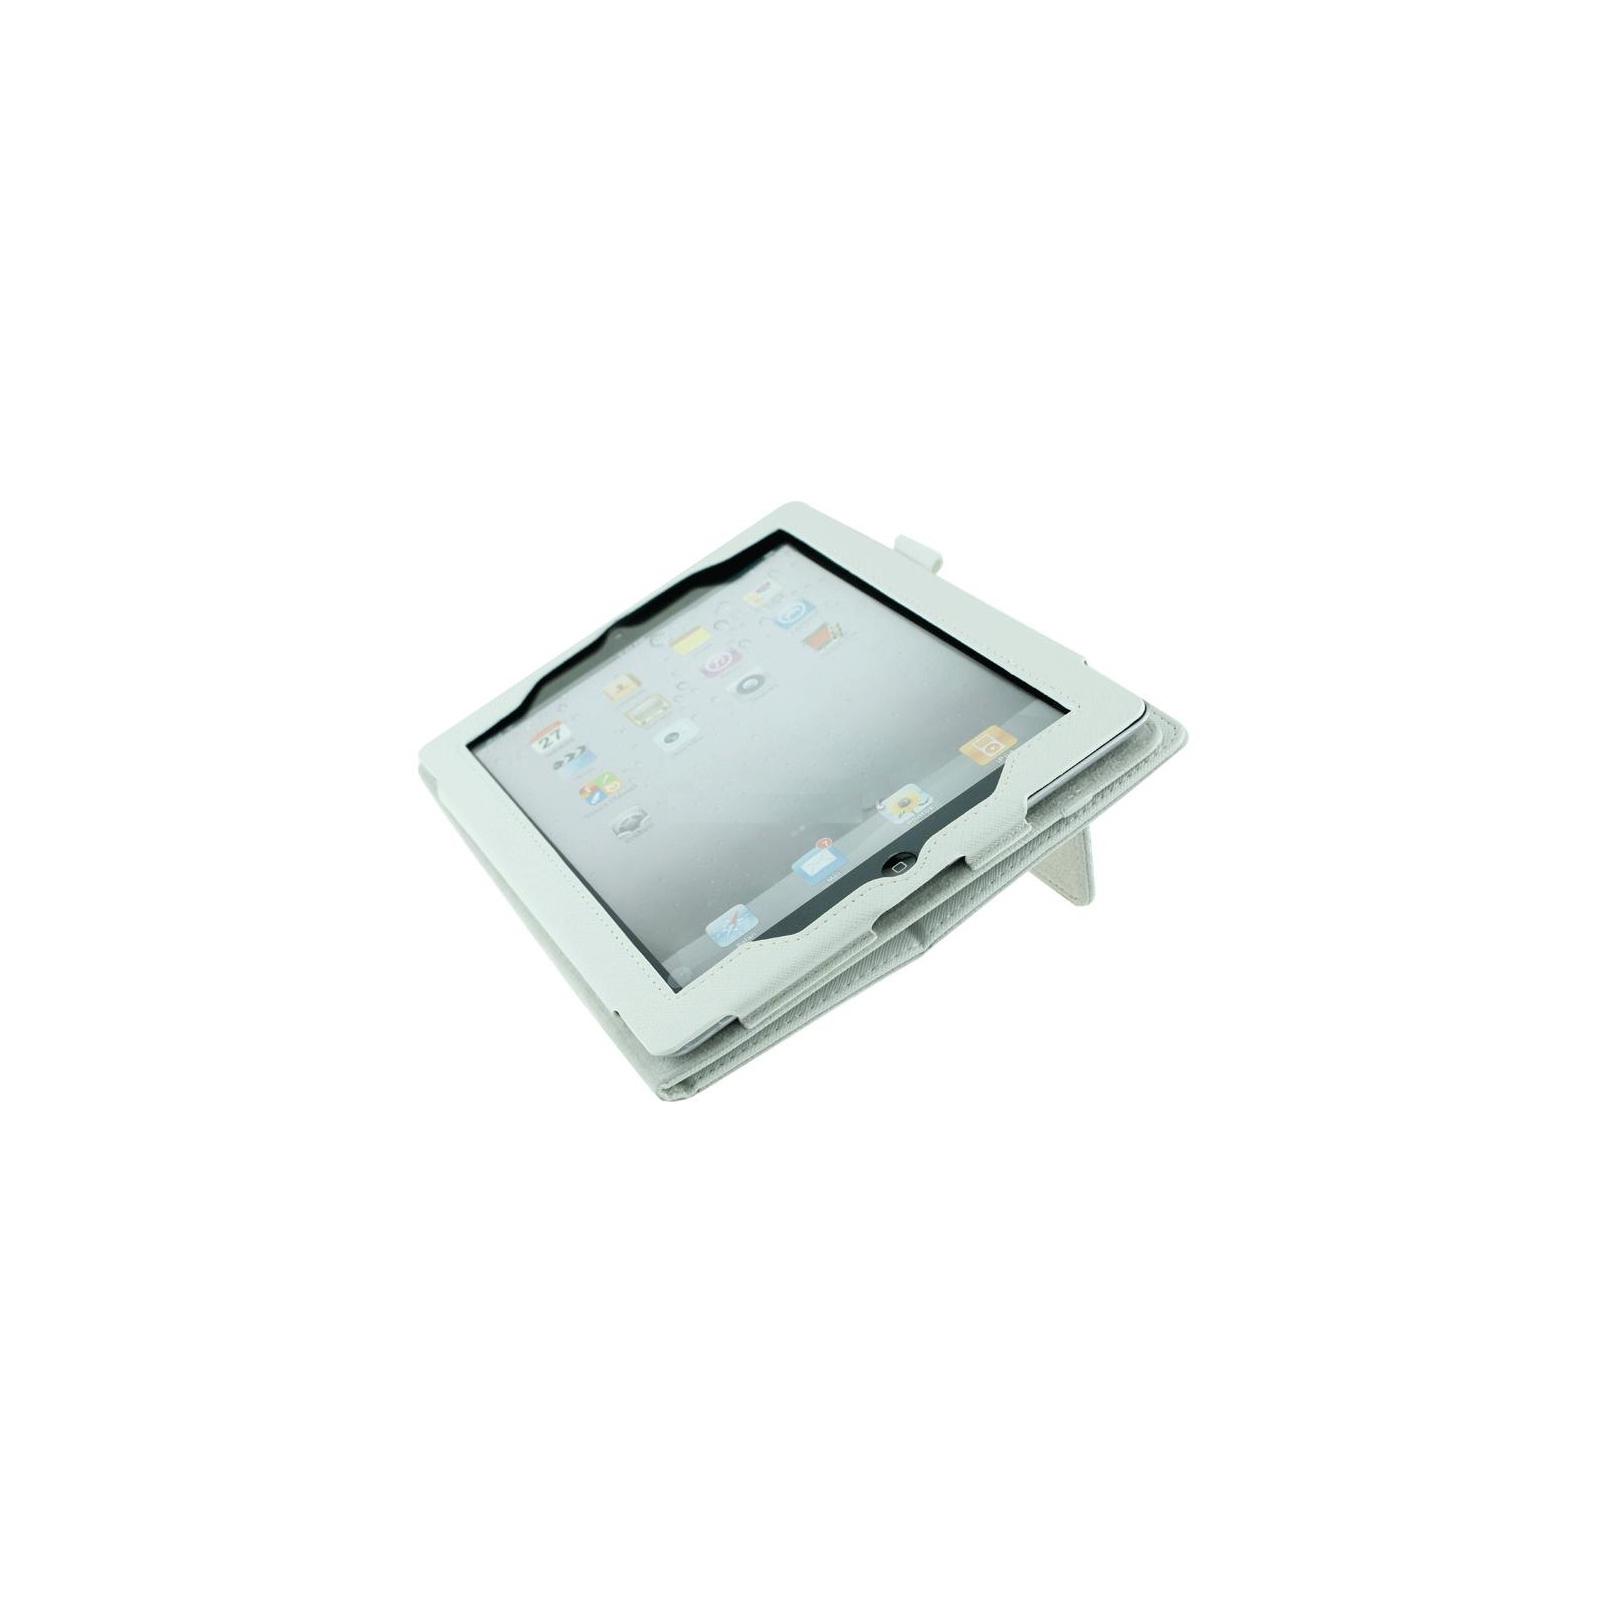 "Чехол для планшета iPearl 9,7"" New iPad з подставкою зелений (IP12-ADHD-08501E white) изображение 3"